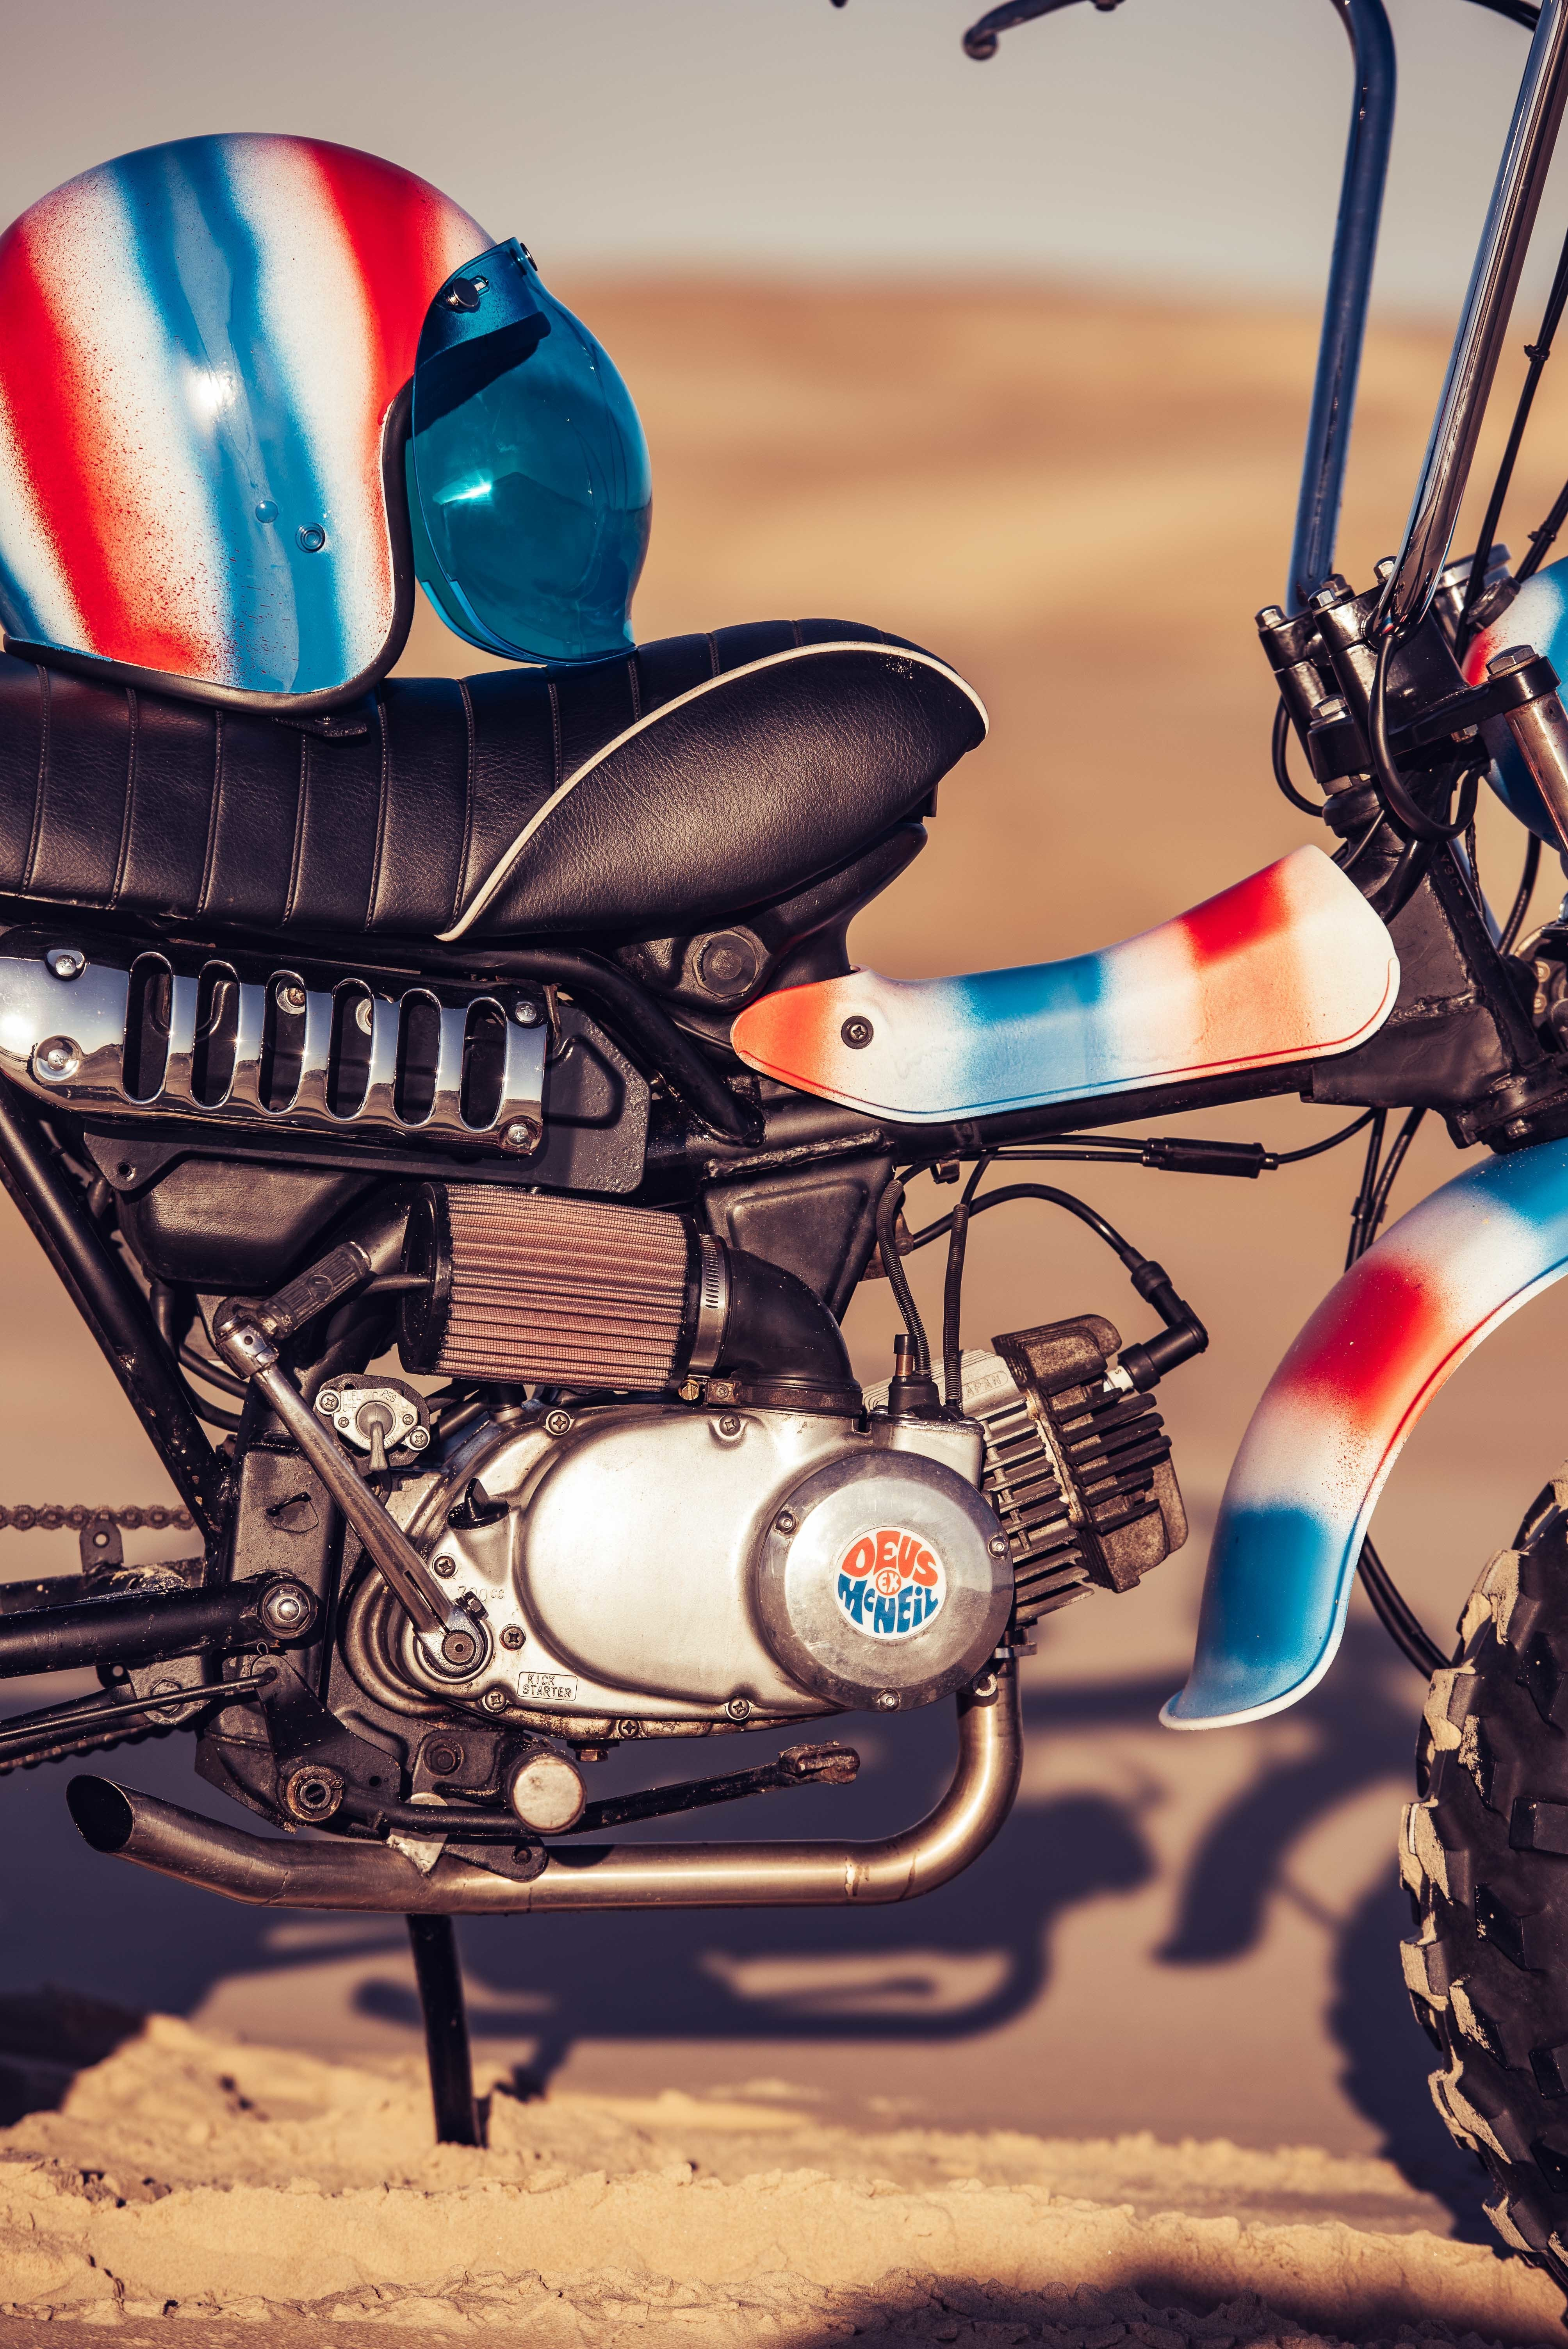 Goof Bike